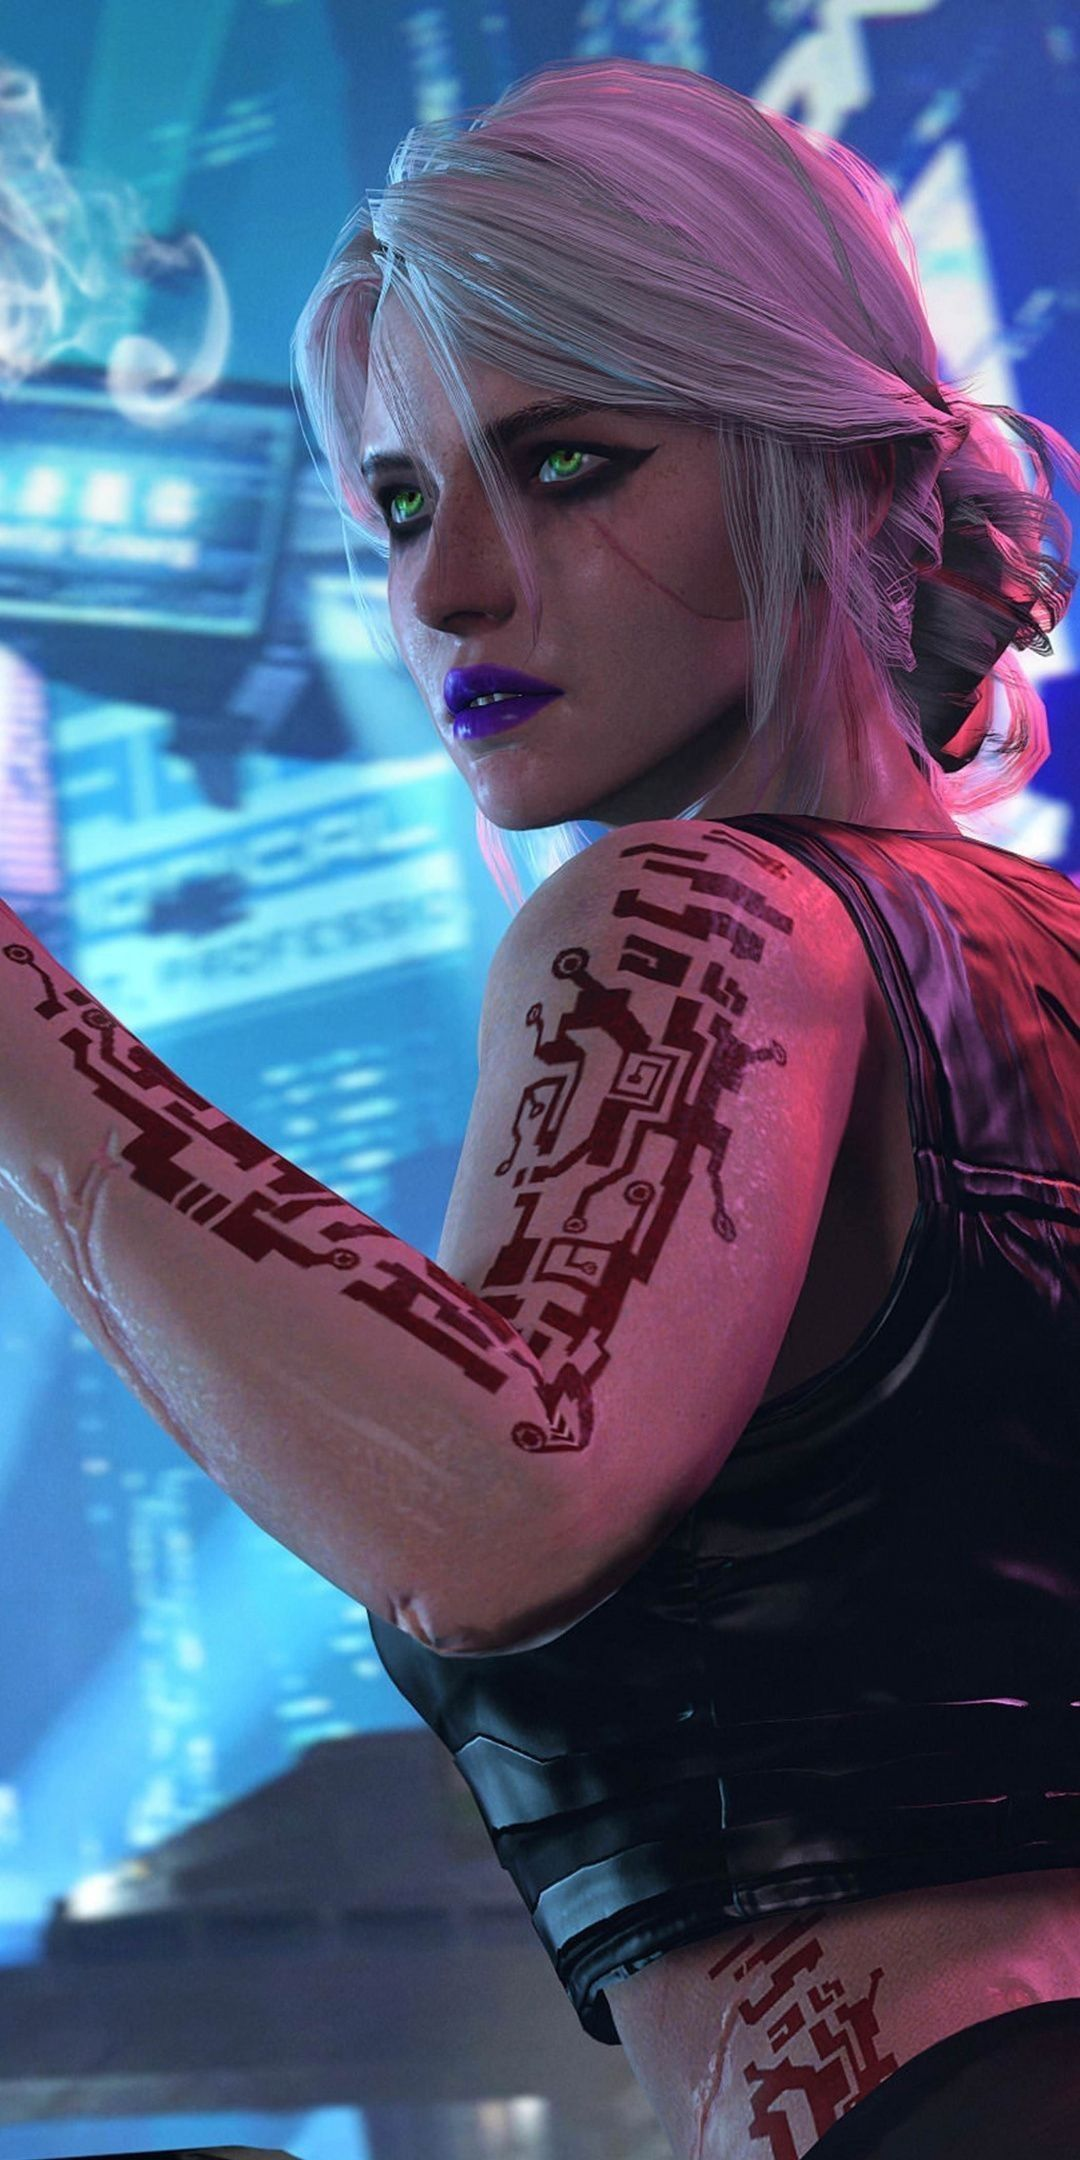 portrait photography Cyberpunk girl, Cyberpunk aesthetic